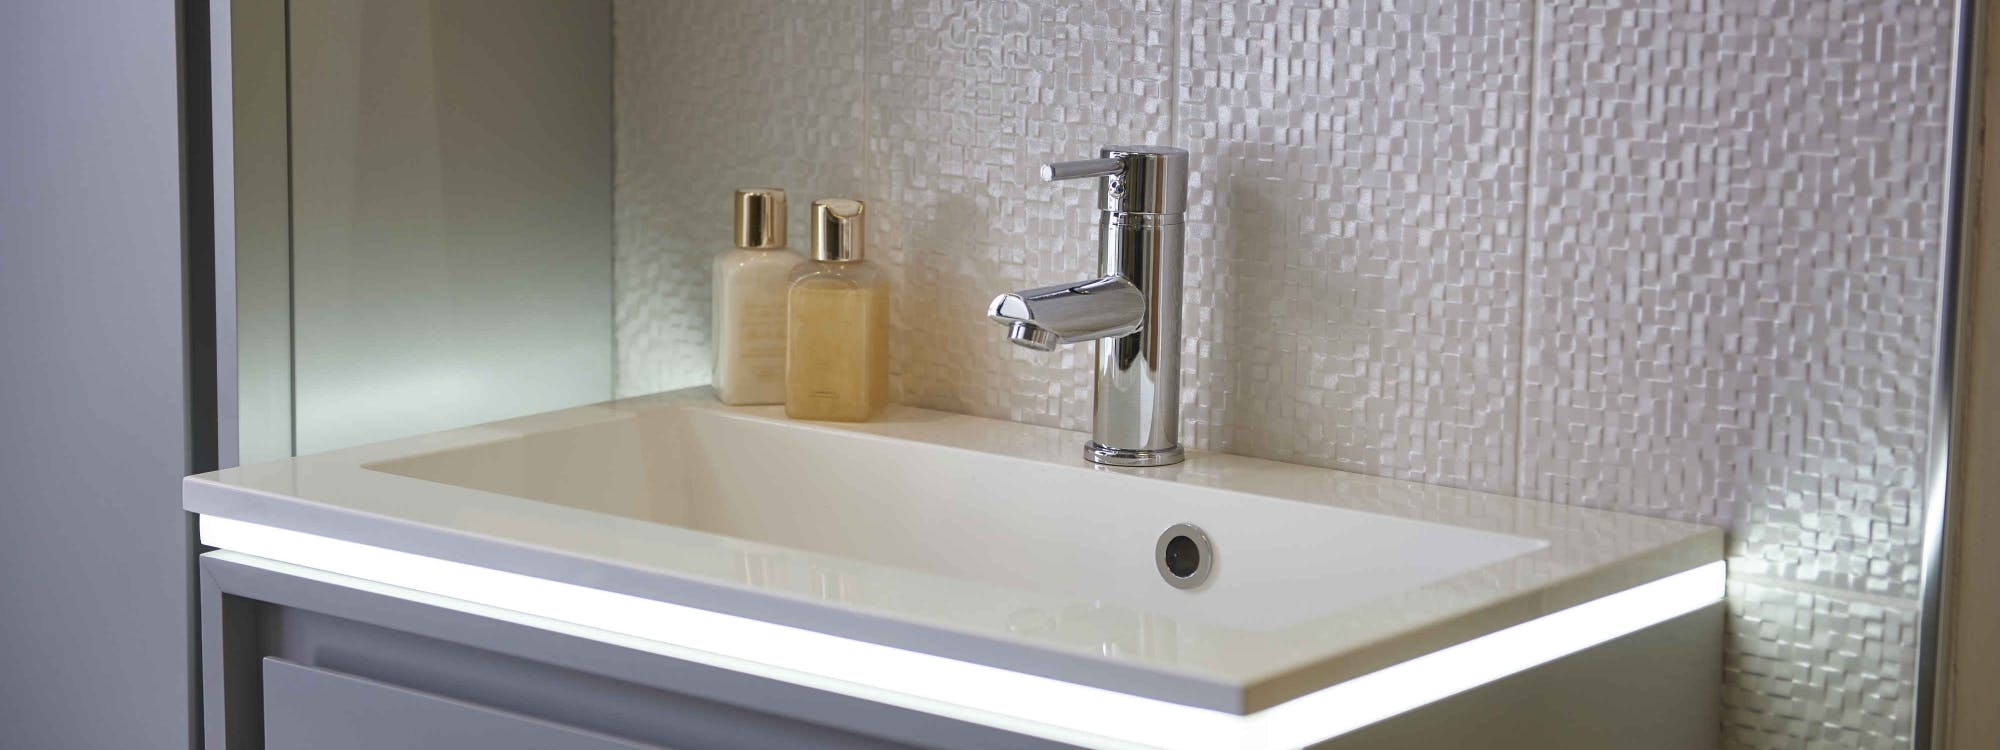 Bradford Bathrooms | Bathrooms Bradford | More Bathrooms Design & Install